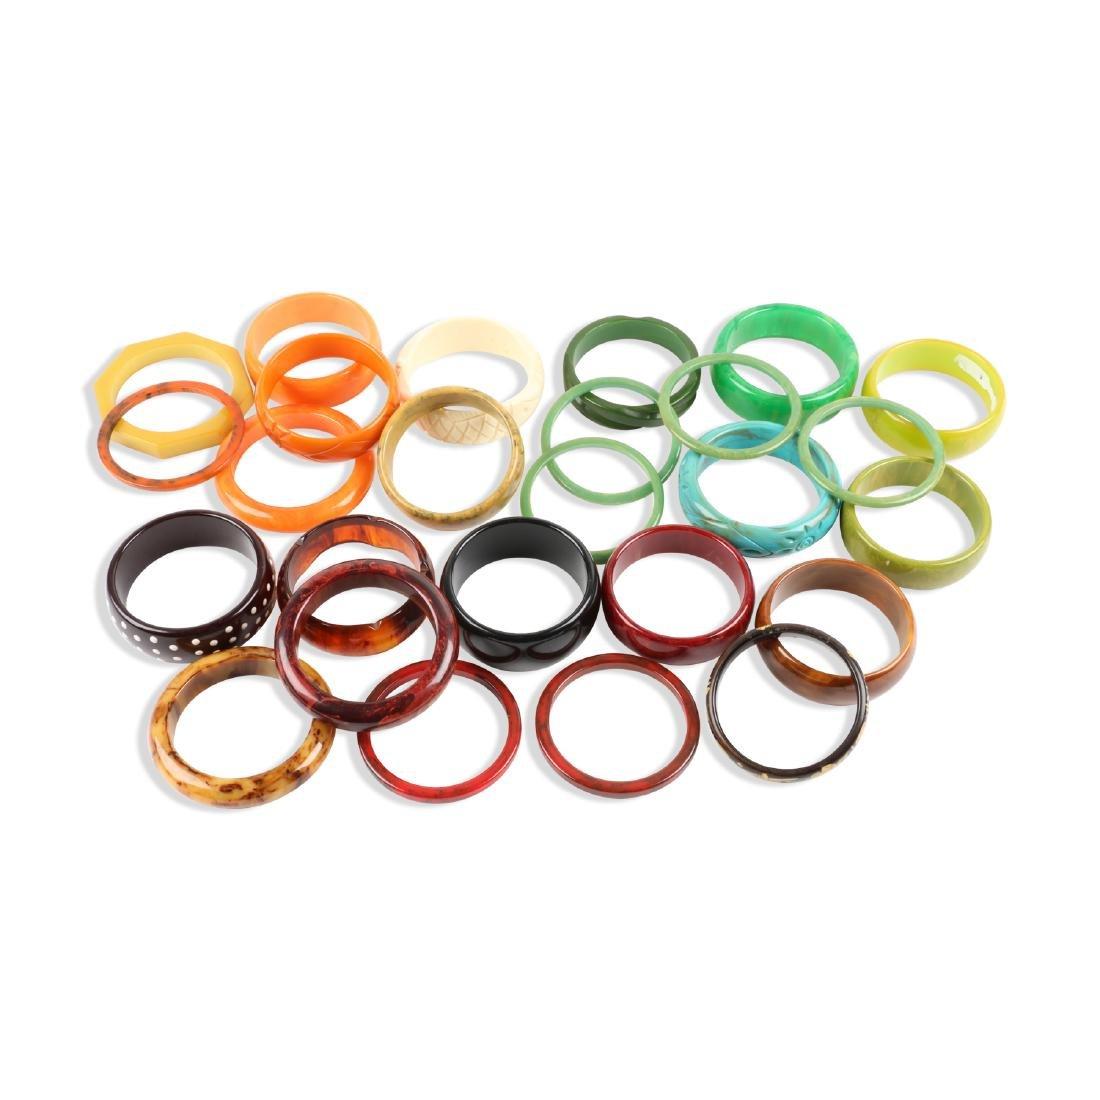 Assorted Bakelite Bangle Bracelets